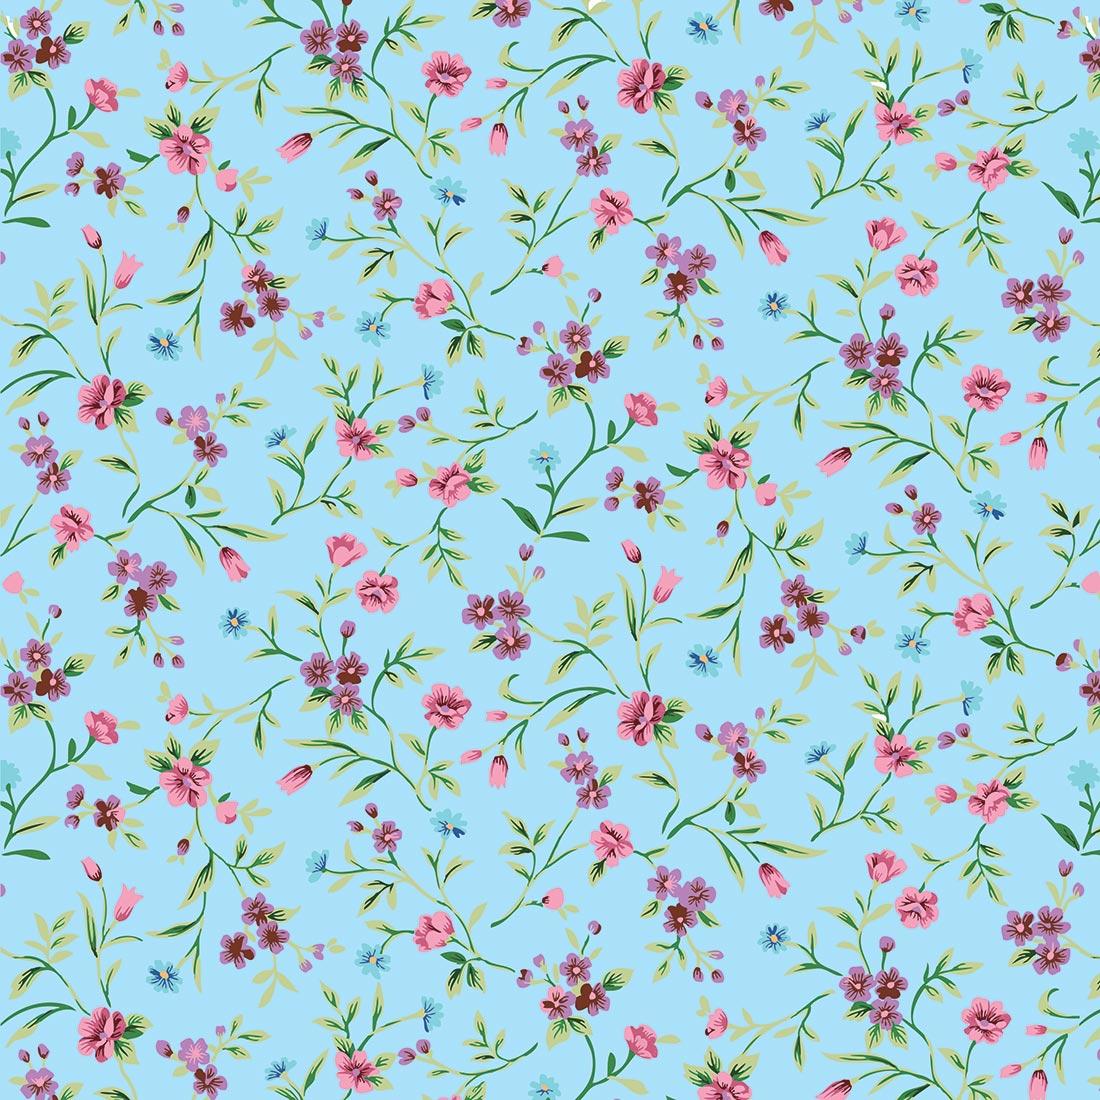 Papel de Parede Floral Flores no Fundo Azul